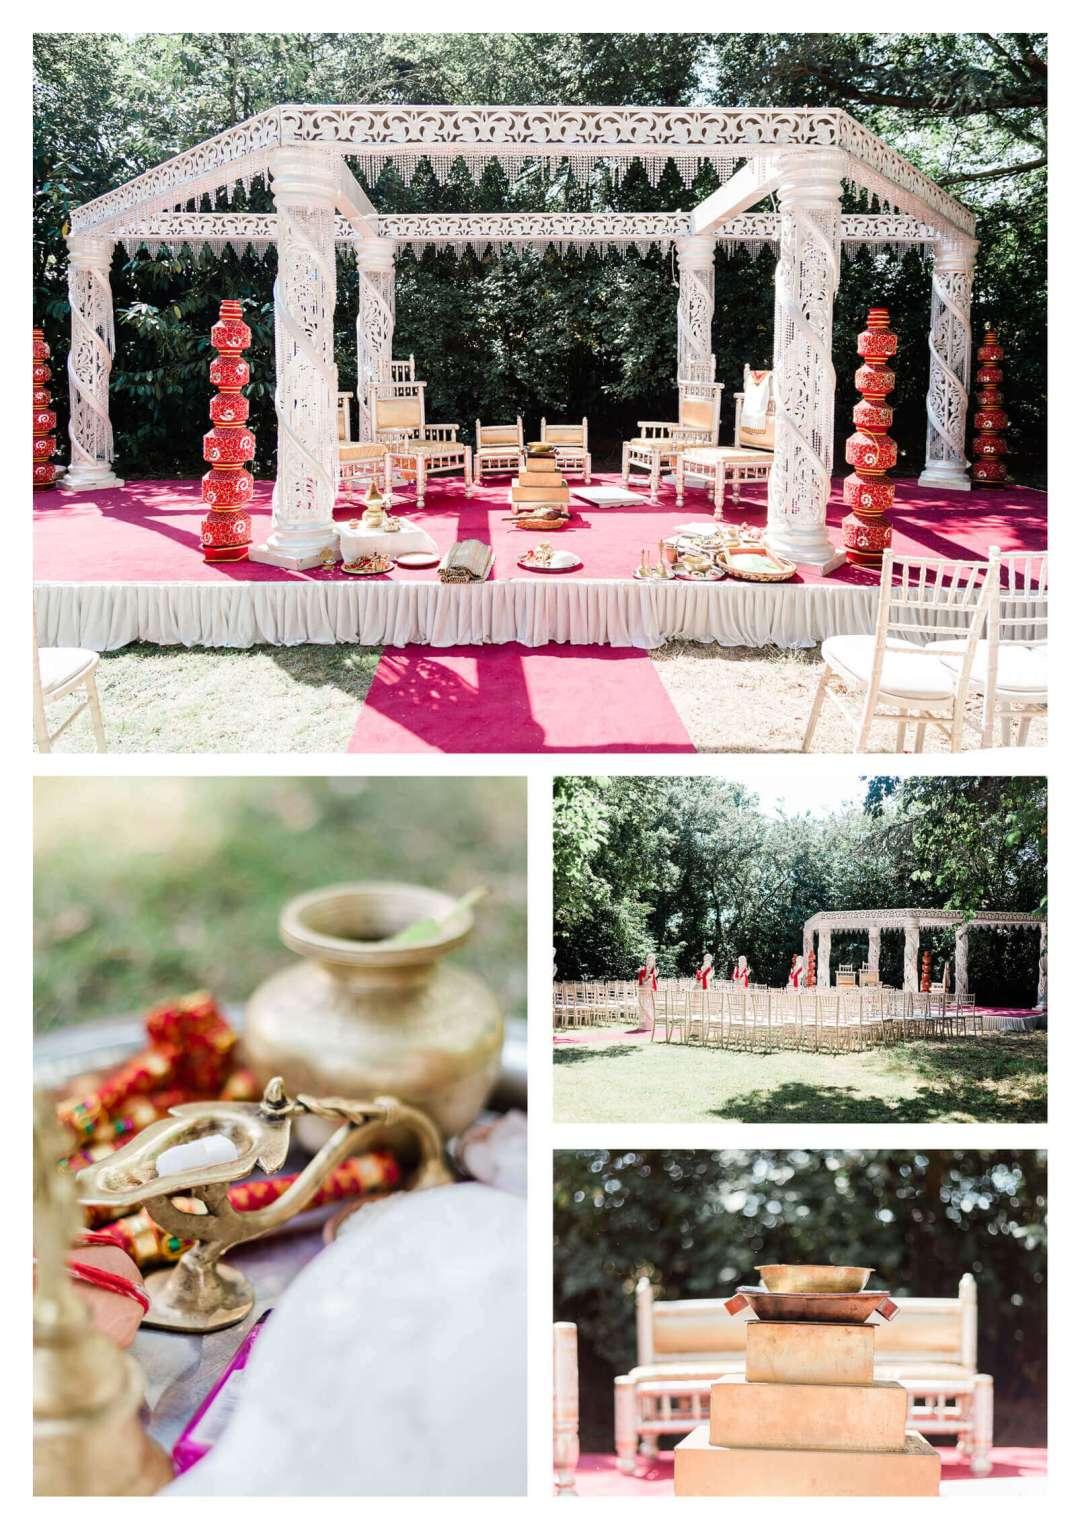 Baddow Park Hindu wedding ceremony | Essex photographer